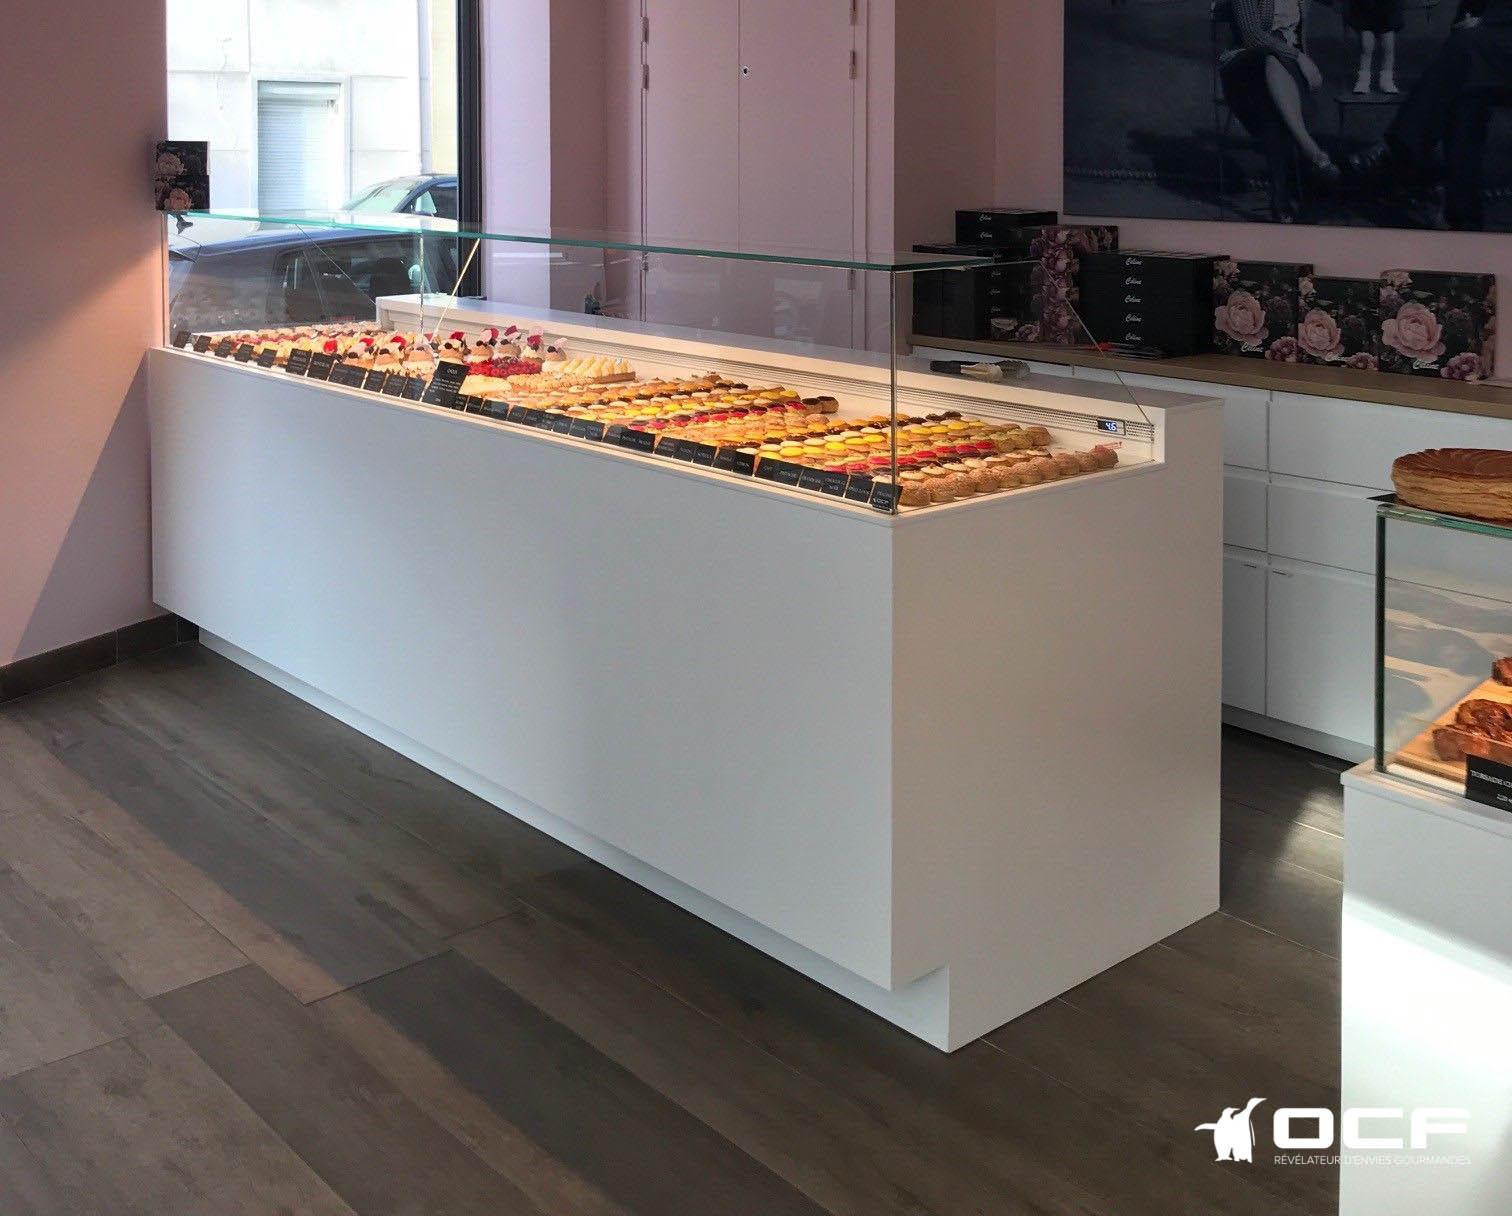 Céline Atelier Gourmand - Boulogne Billancourt (92) - Vitrine réfrigérée OCF